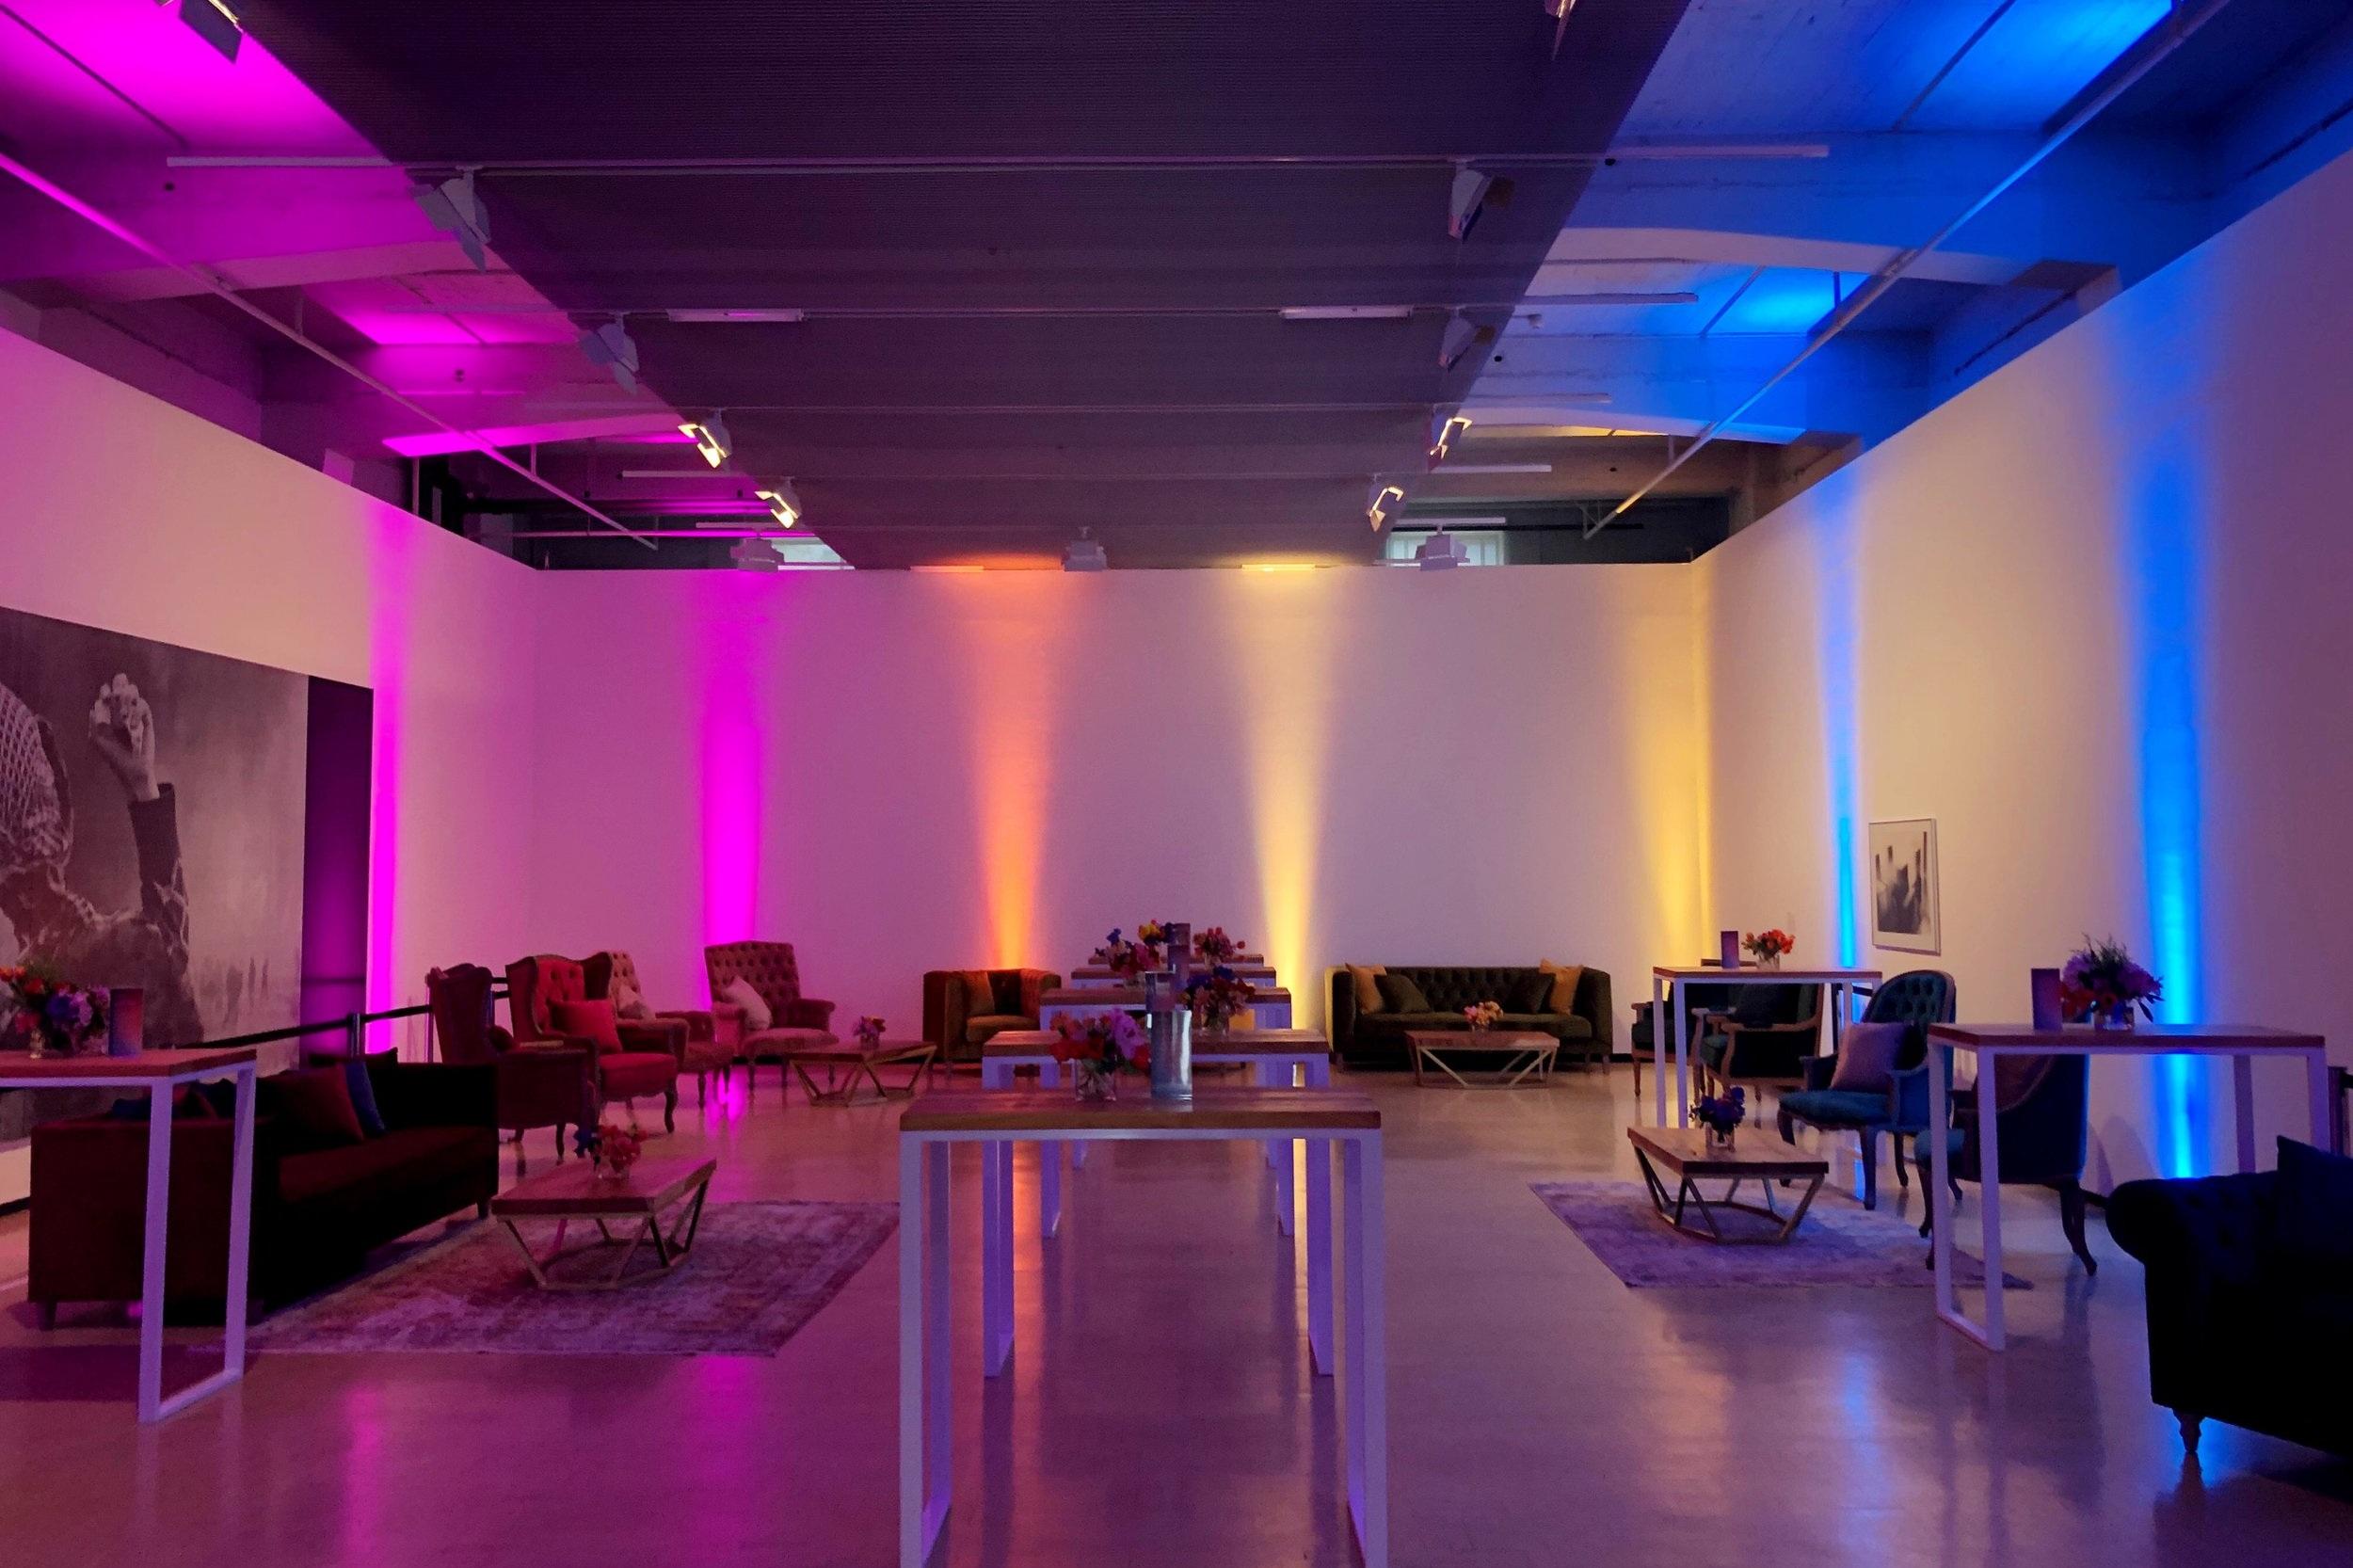 Chorus Brand Launch - Spectrum lounging for new Chorus branding - Wellington Art Gallery.